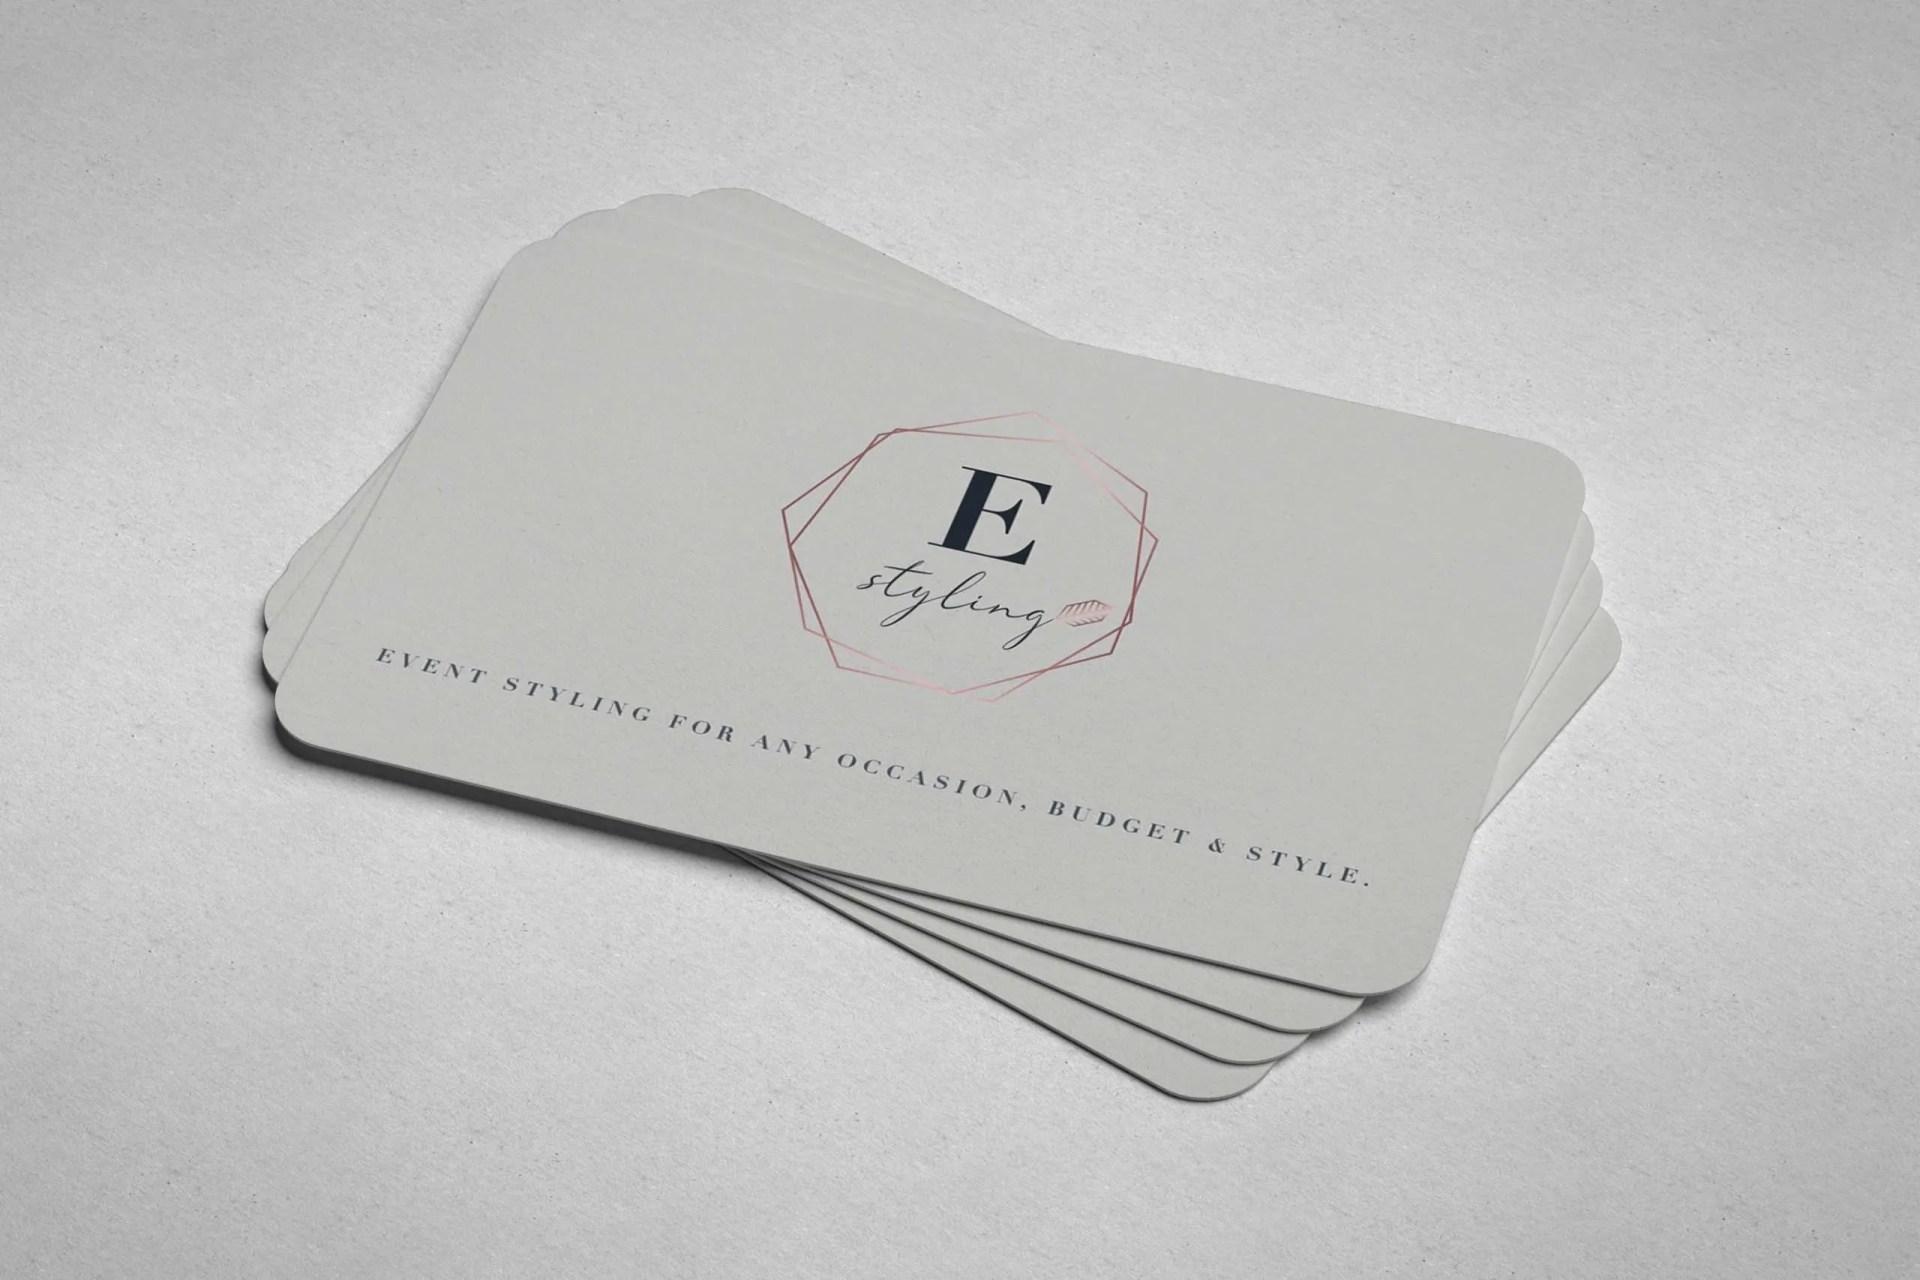 E_Styling_Business_Card_1